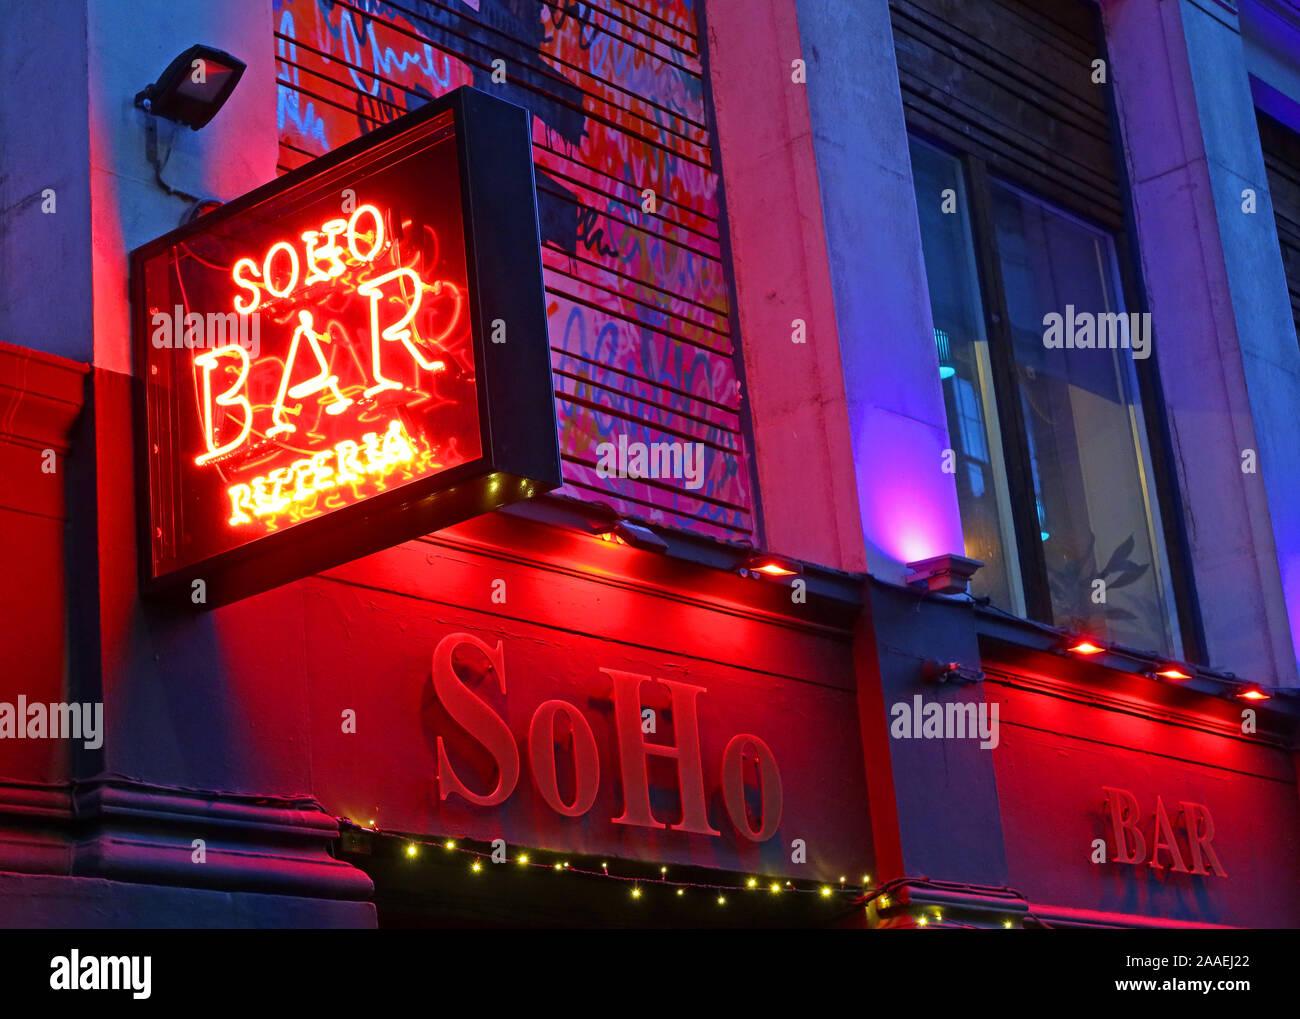 GotonySmith,UK,city,city centre,HotpixUK,@HotpixUK,sign,red,neon sign,G1,Pizzeria,Cocktail Bar,Miller St,City Centre,Glasgow,Scotland,G1 1DT,SoHo,pub,Bar,Soho,City,Centre